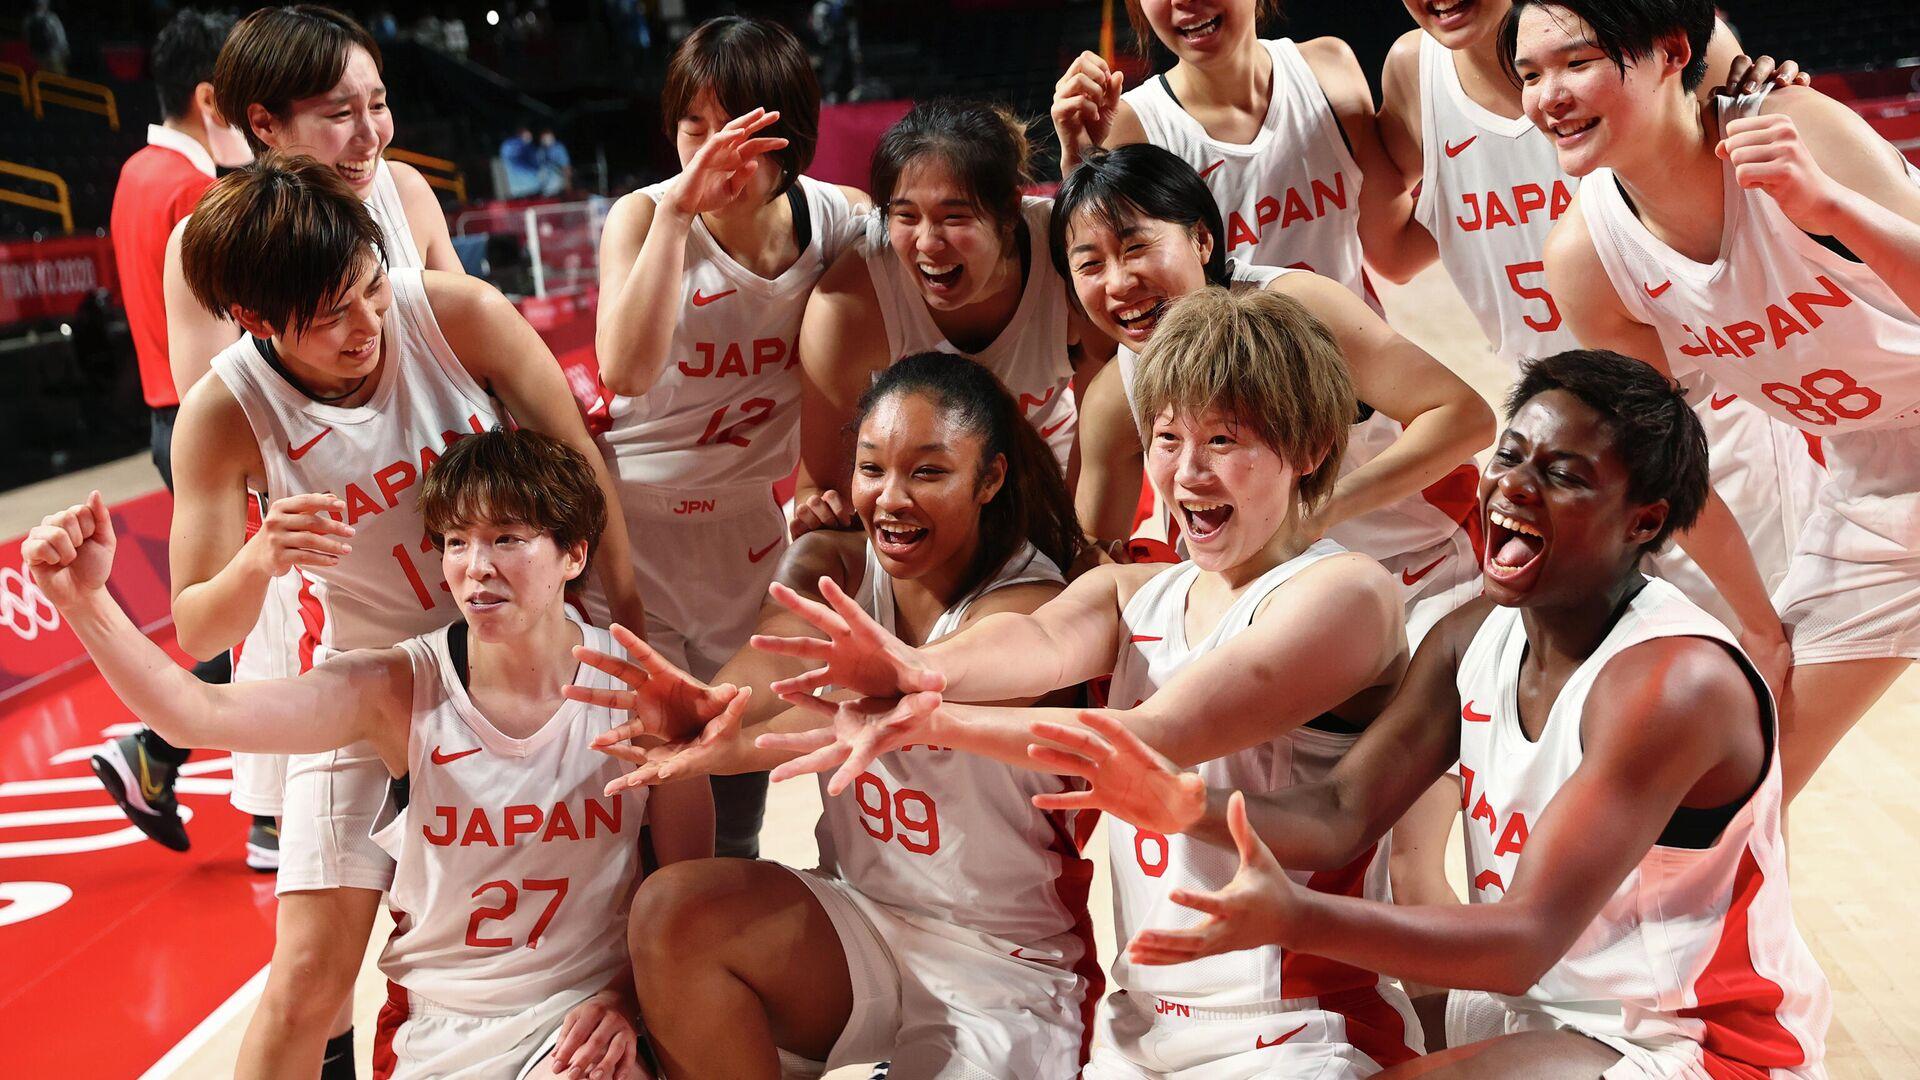 Японские баскетболистки - РИА Новости, 1920, 04.08.2021